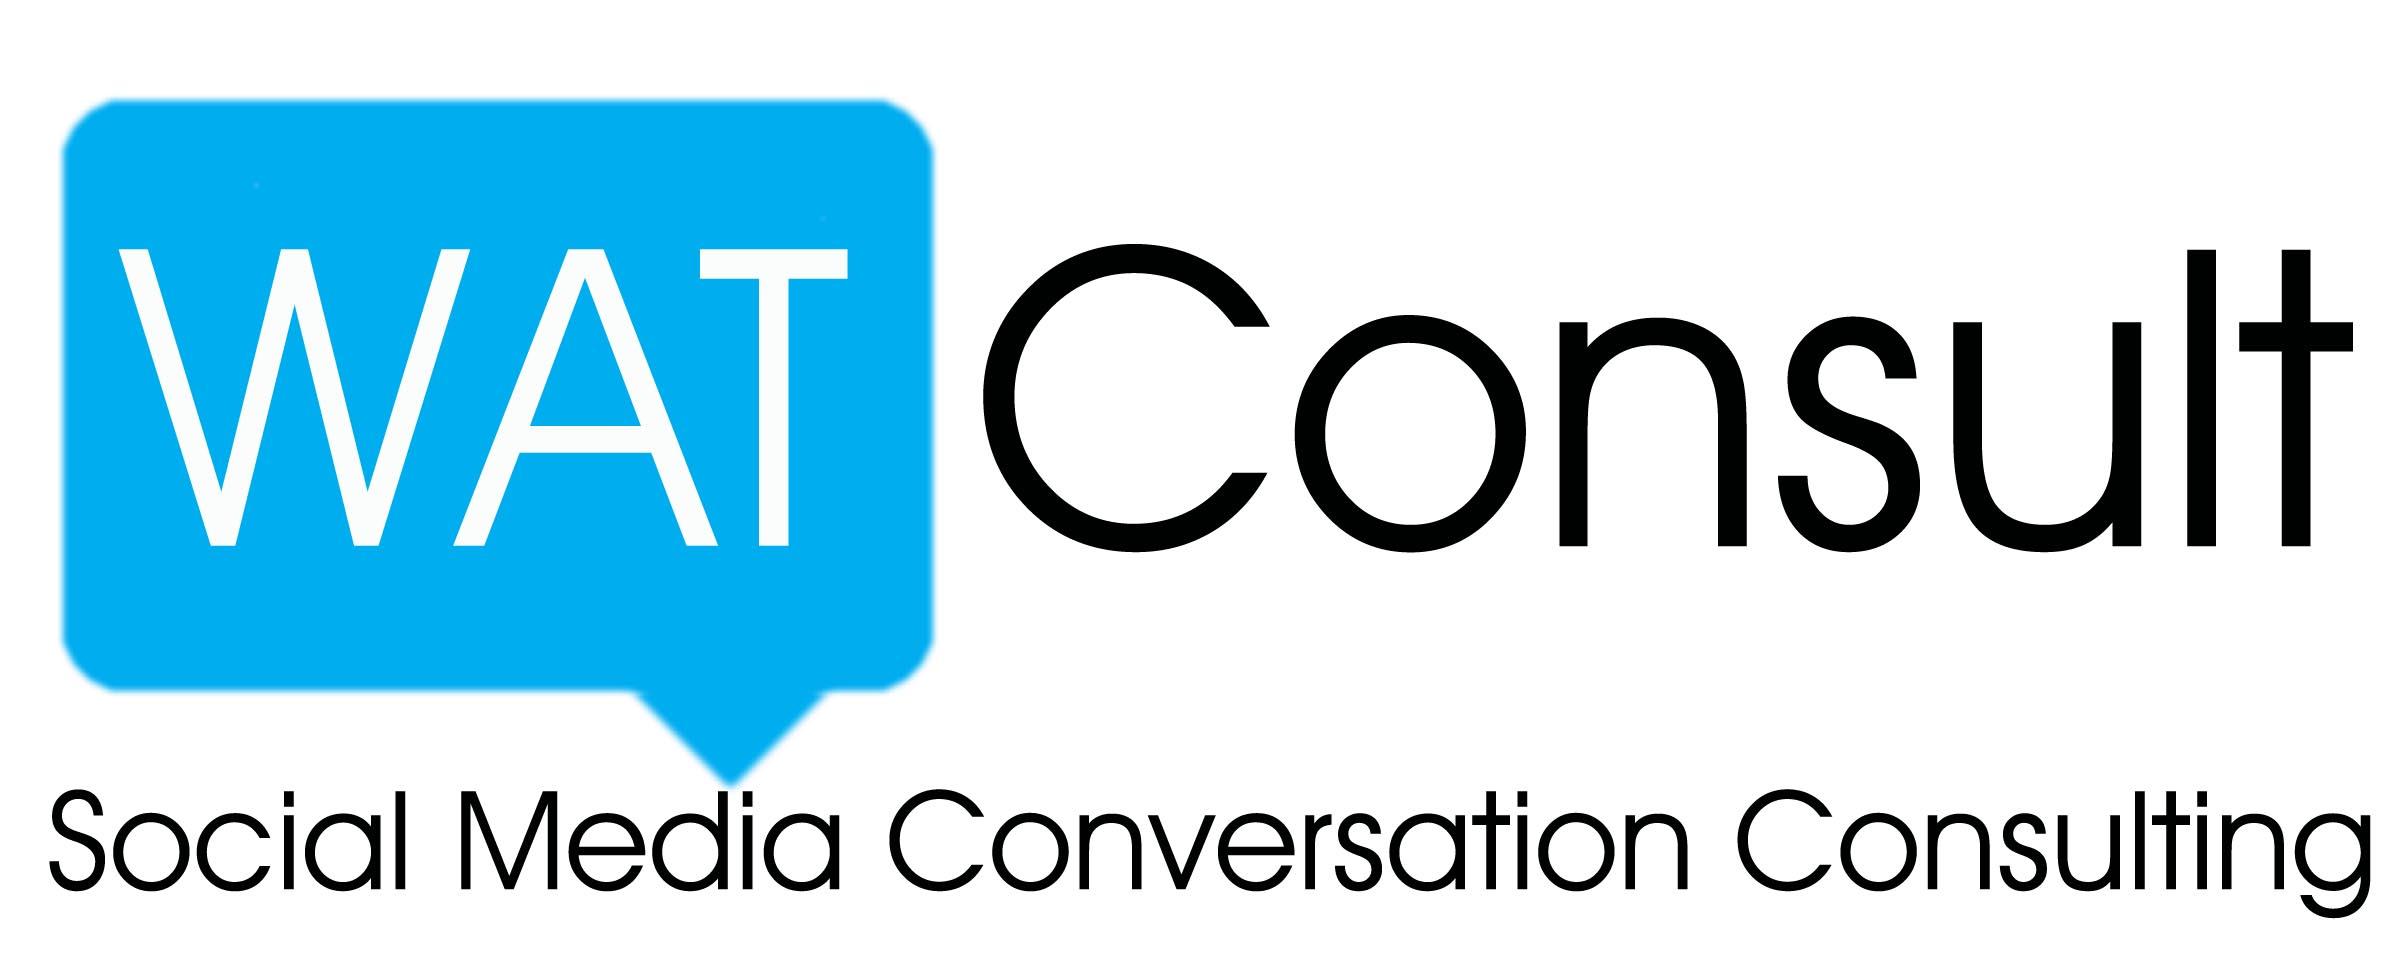 Social media agency functionality: WATConsult